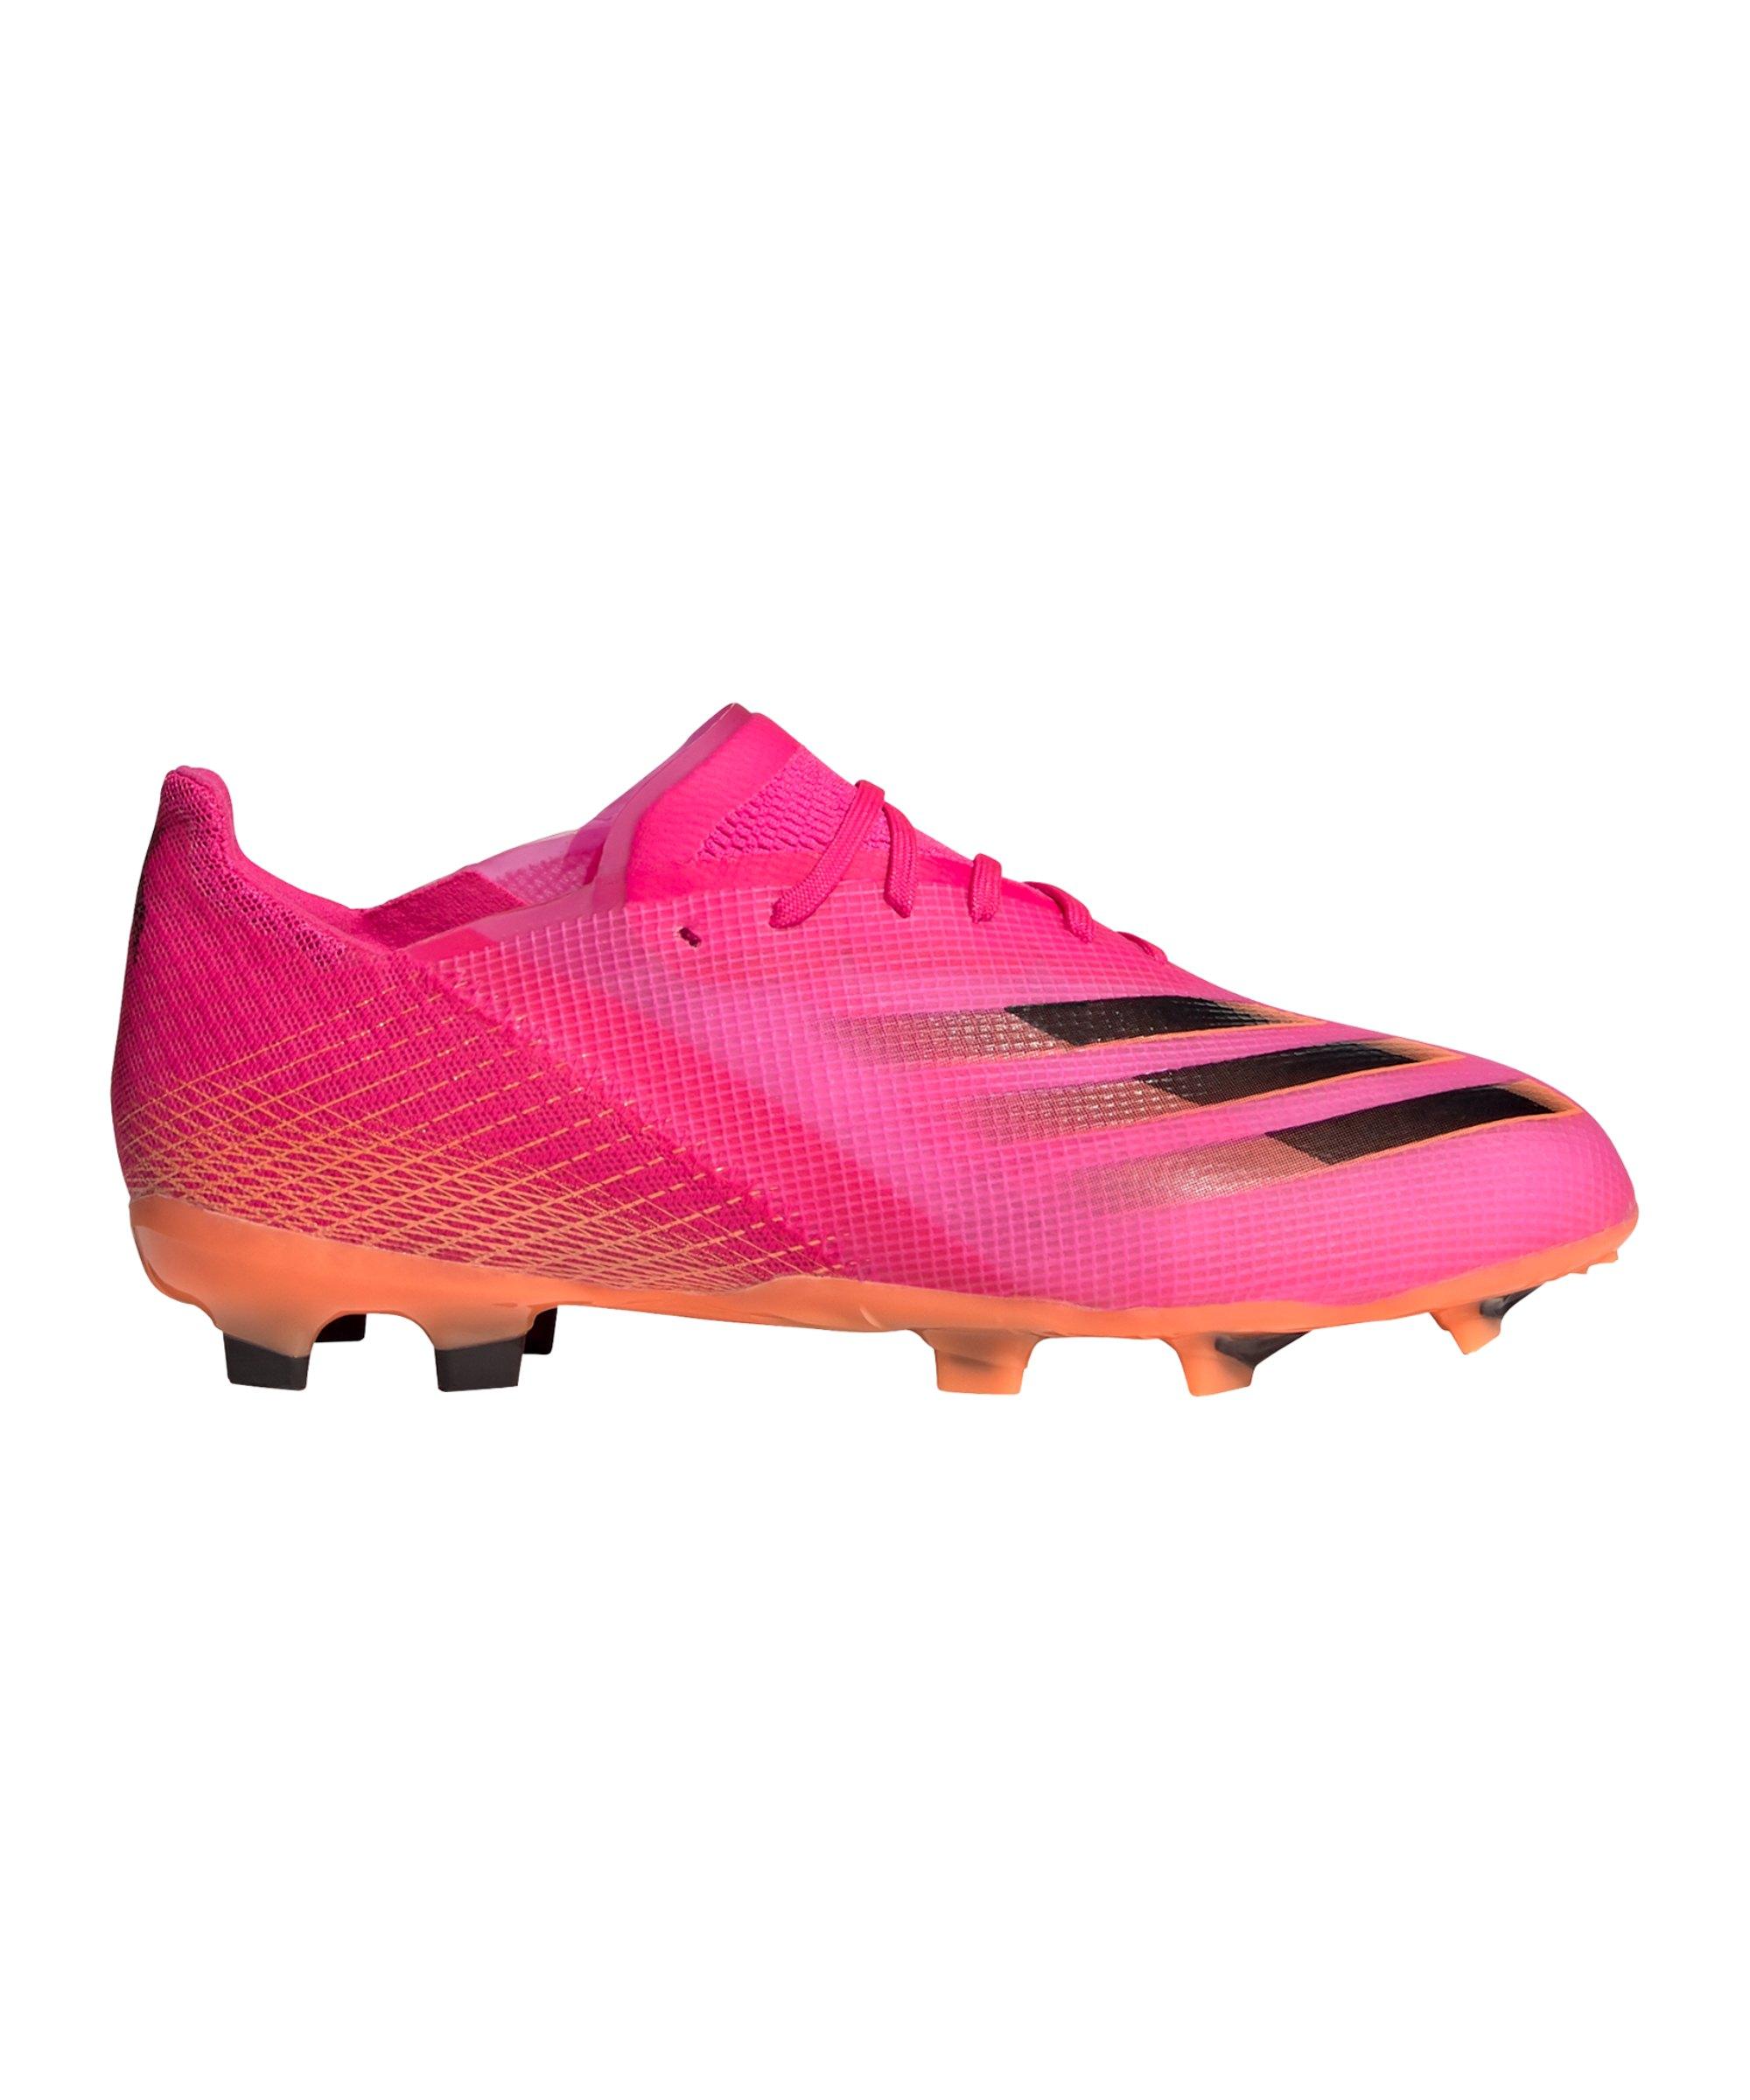 adidas X GHOSTED.1 FG Superspectral J Kids Pink Schwarz Orange - pink